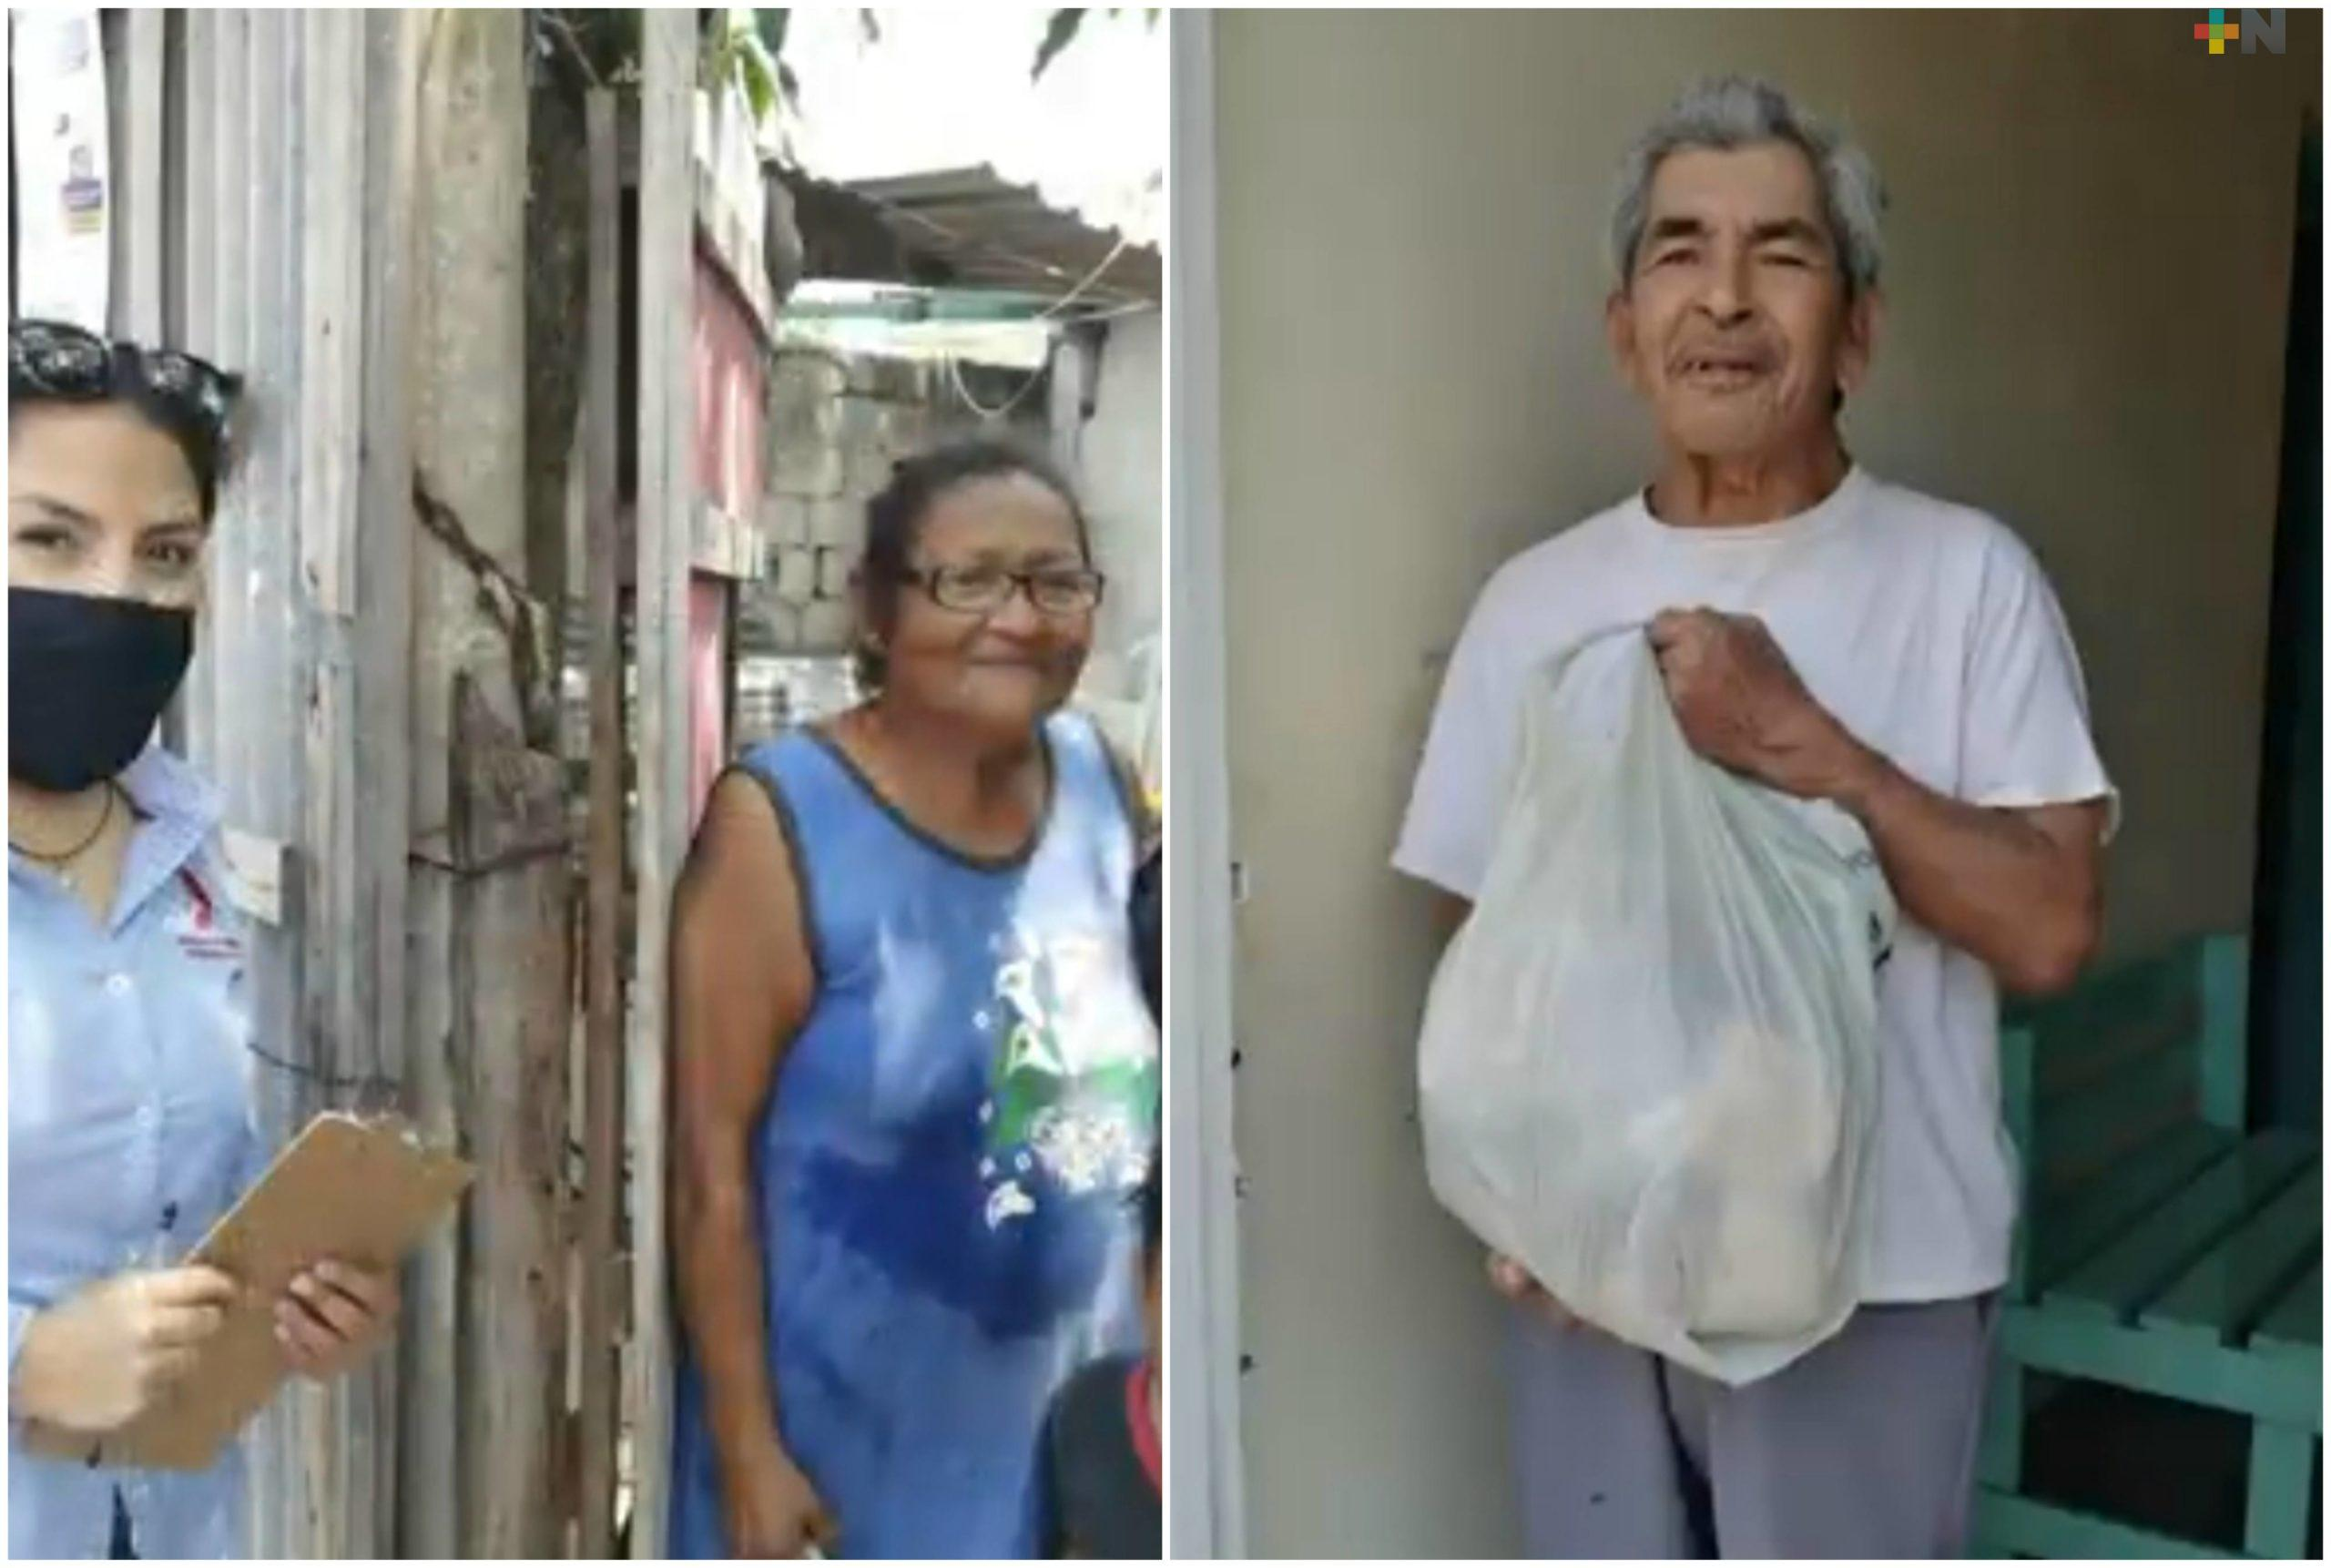 ADEMM ha apoyado a 300 familias veracruzanas con despensas alimenticias